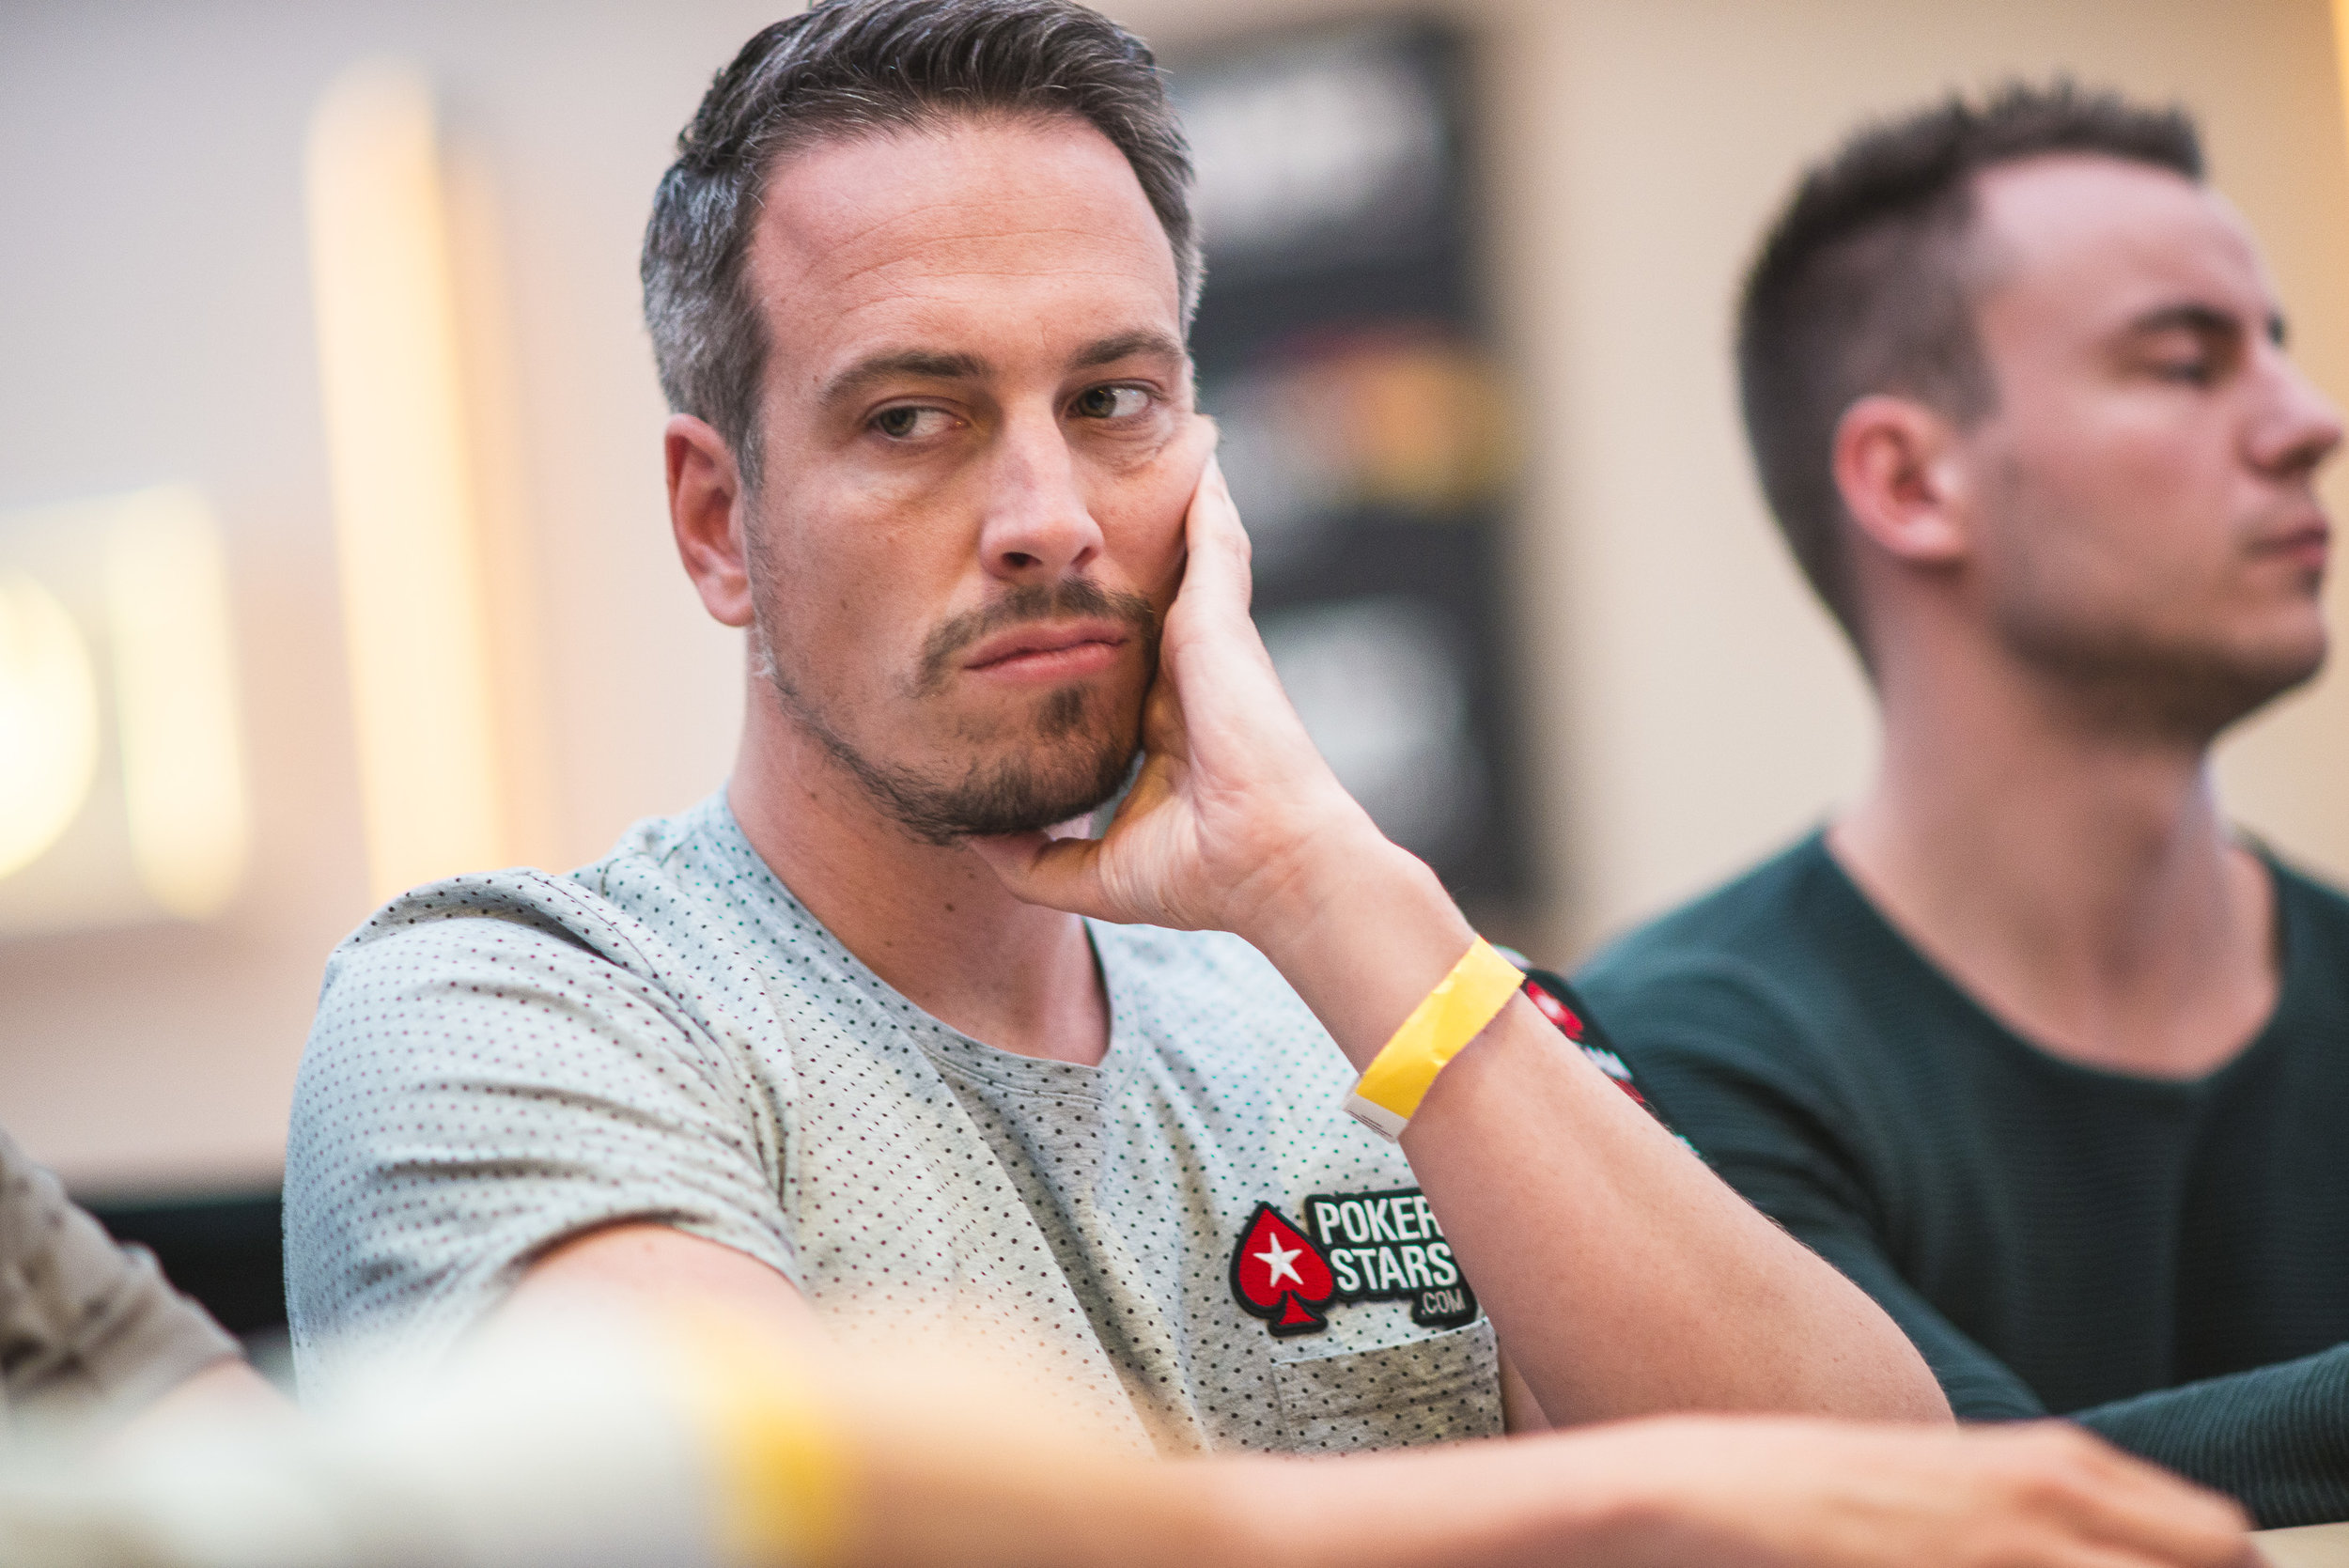 World Poker Tour_Lex Velhuis_DA63525.jpg